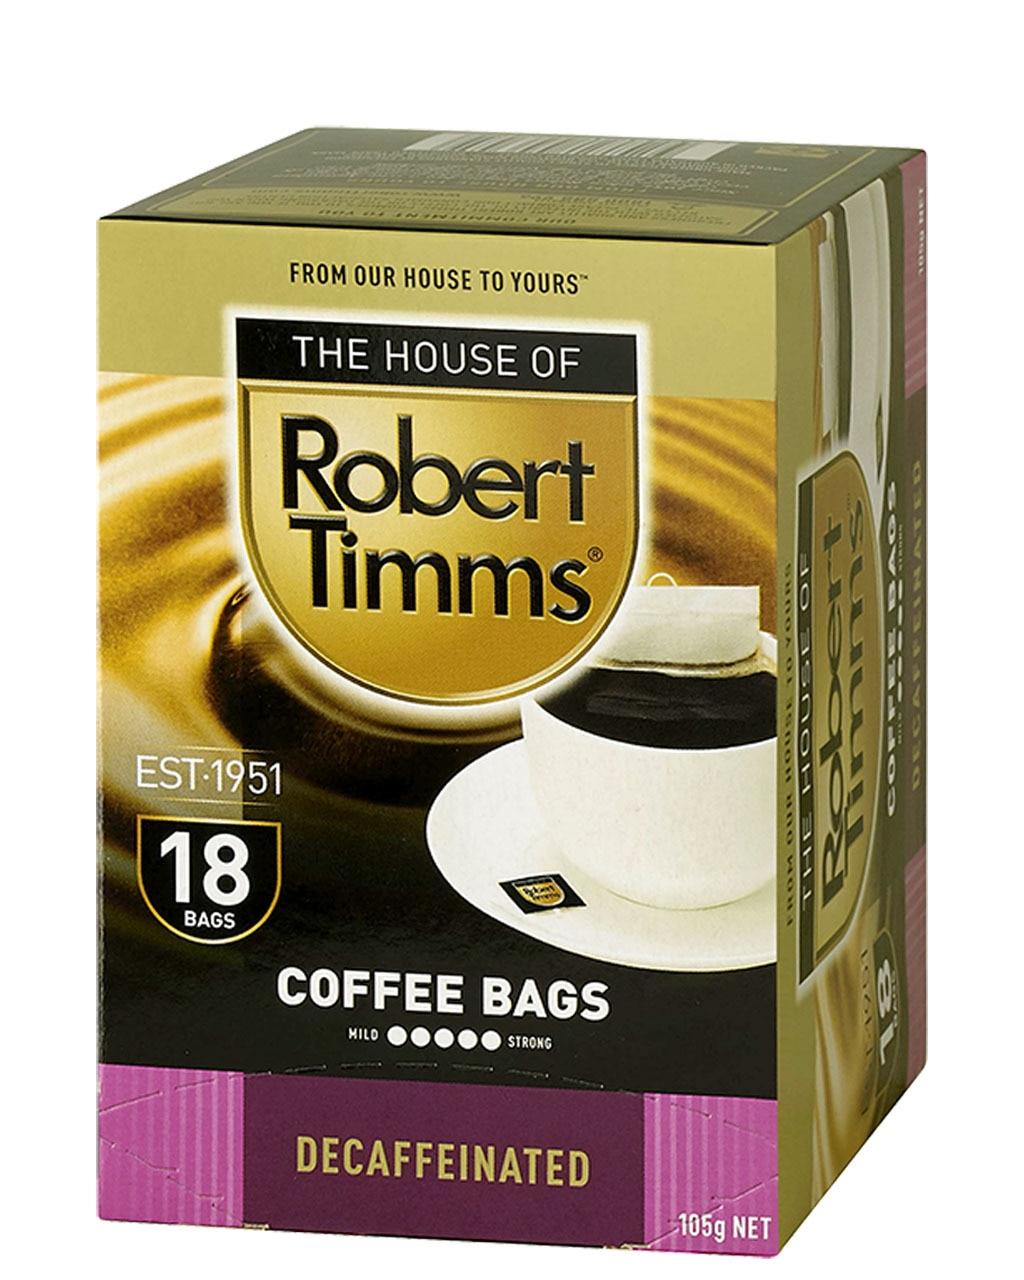 Decaffeinated Coffee Bags